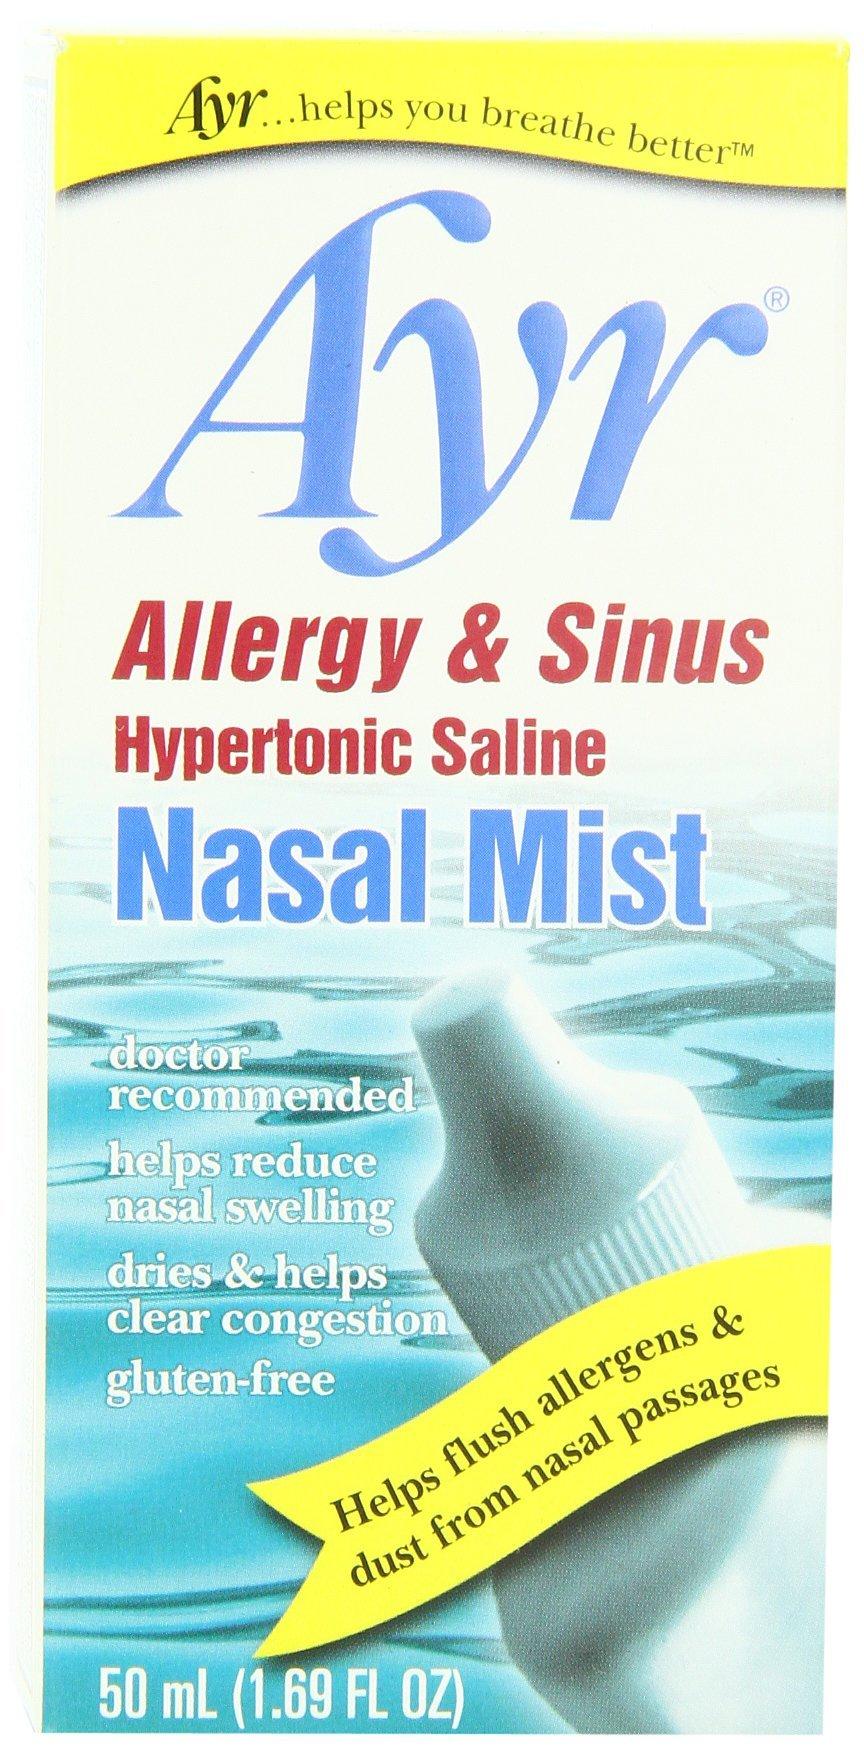 Ayr Allergy & Sinus Hypertonic Saline Nasal Mist, 1.69 Ounce Spray Bottle